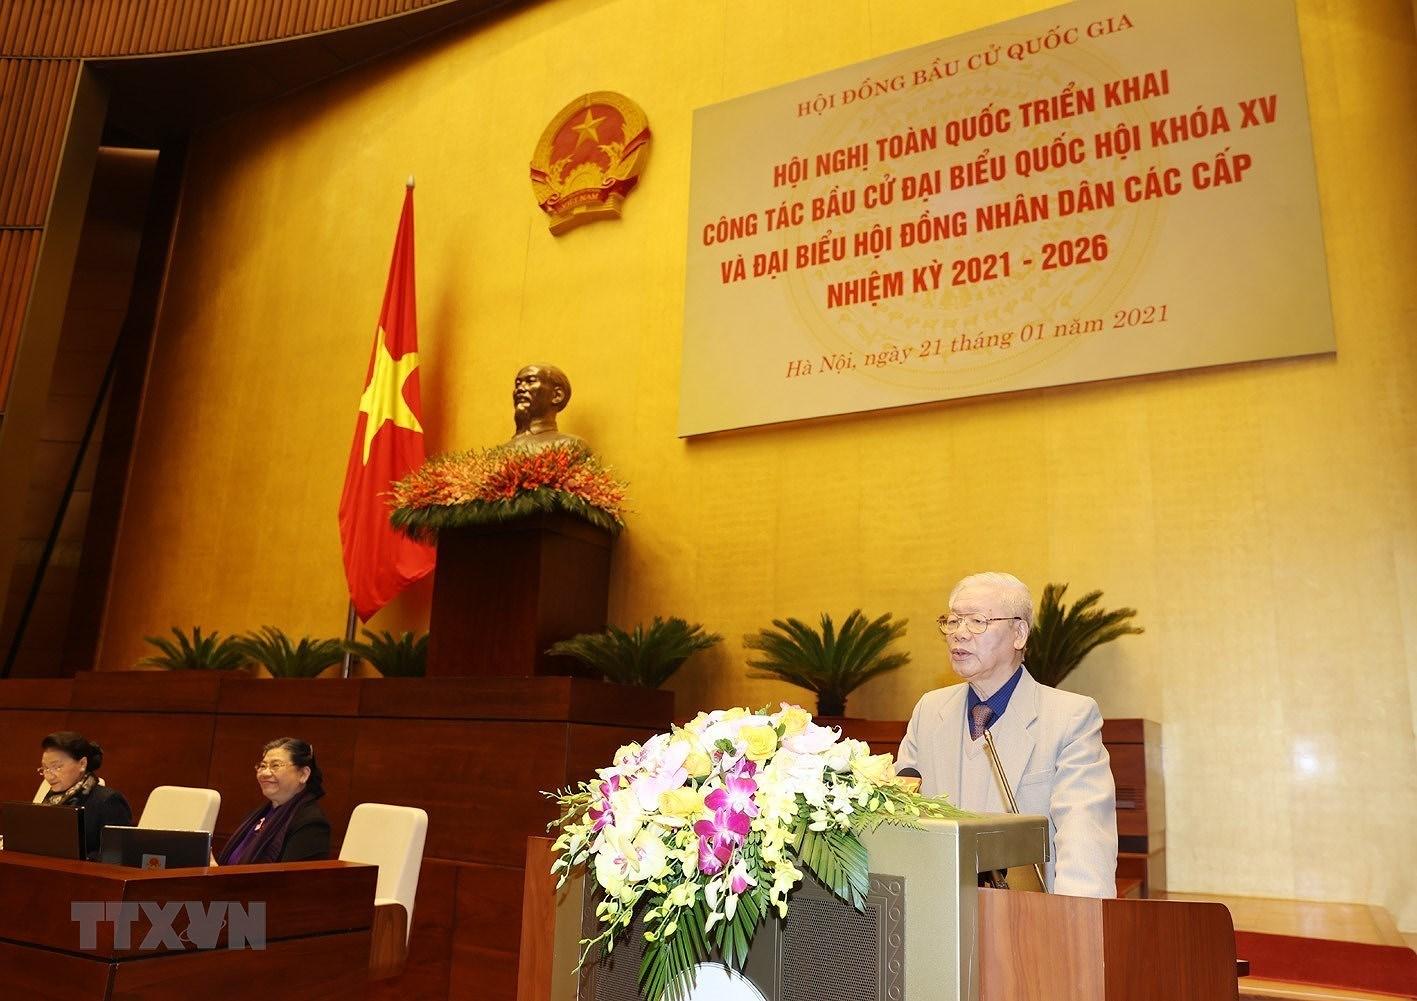 Tong Bi thu, Chu tich nuoc chi dao Hoi nghi trien khai cong tac bau cu hinh anh 5